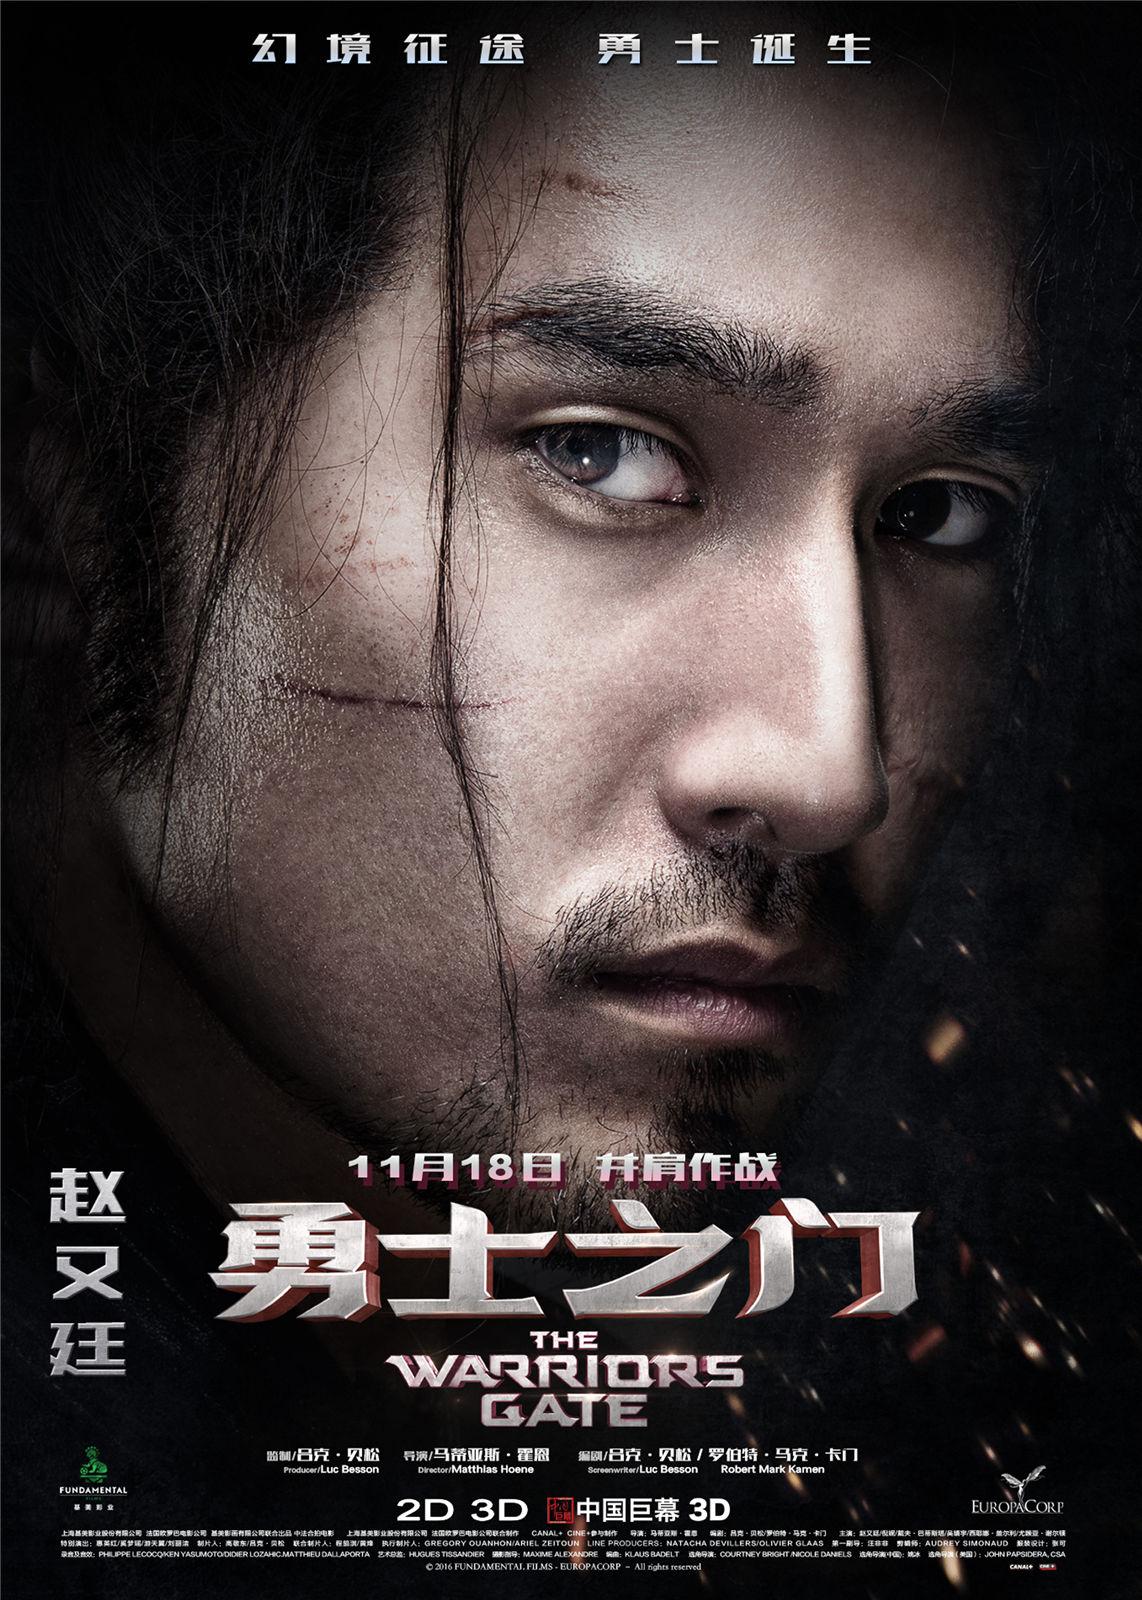 enter the warriors gate movie cast